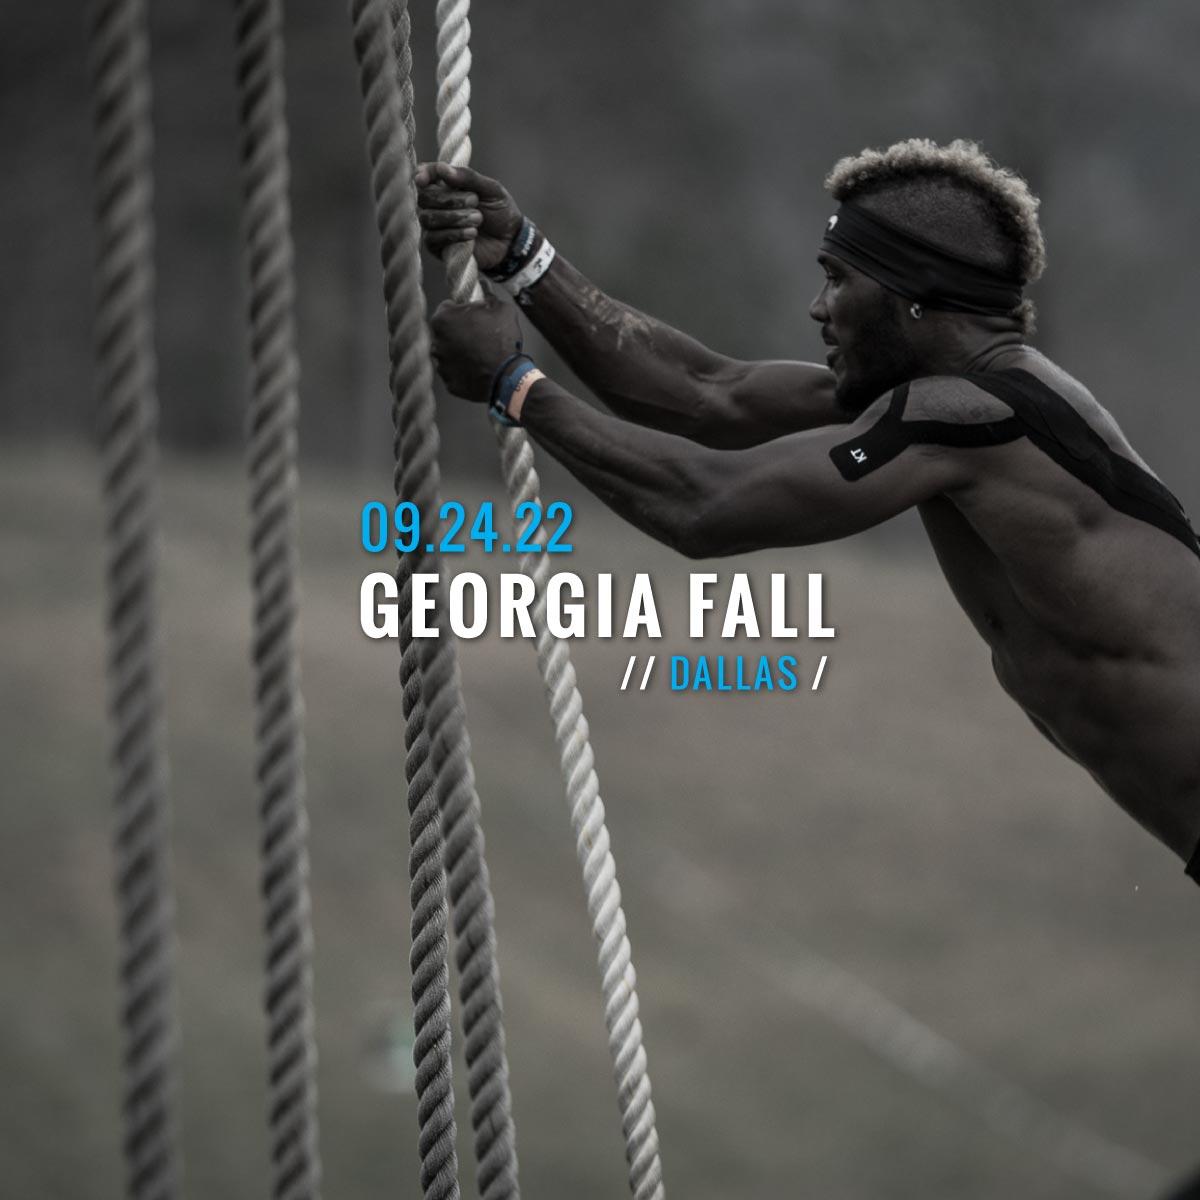 Spectator Pass - Savage Race Georgia Fall 2022